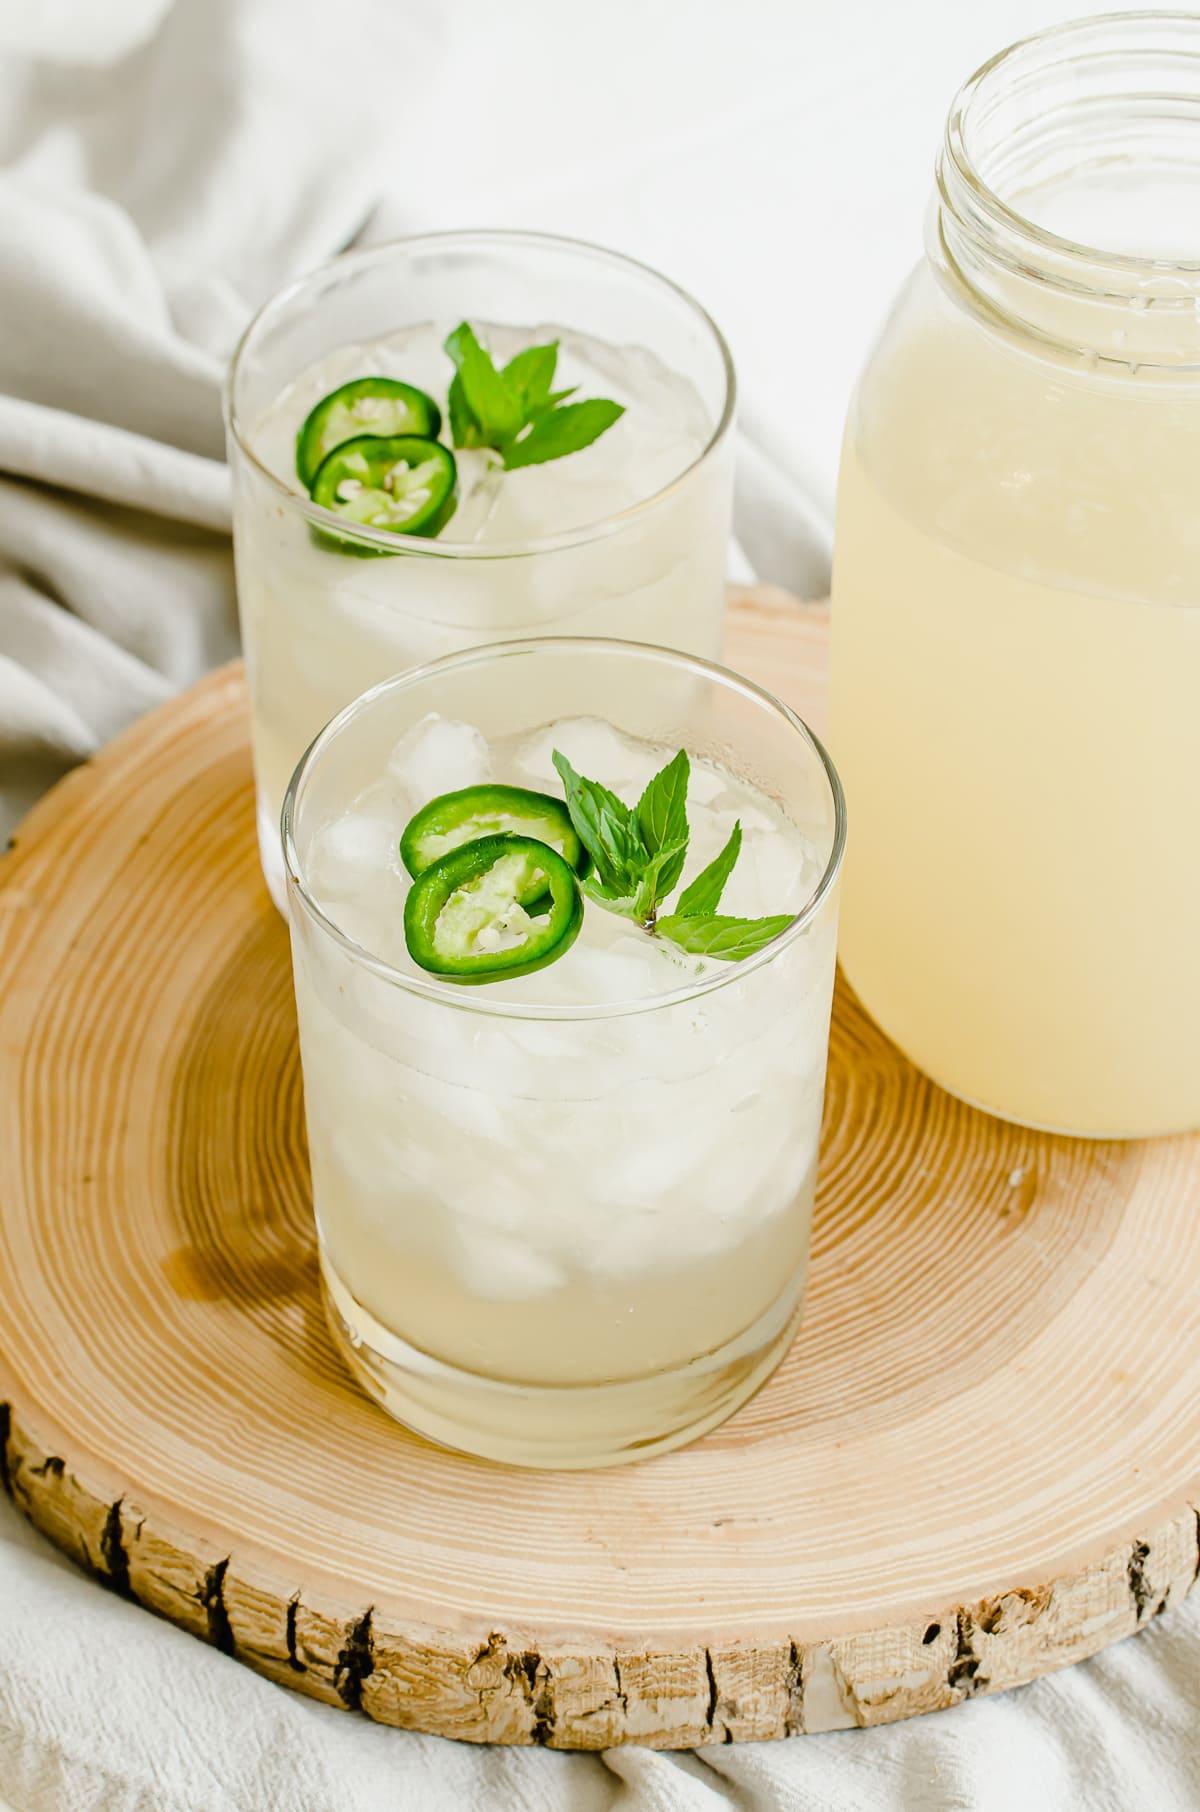 Glasses of lemonade with a large Mason jar of lemonade on the side.